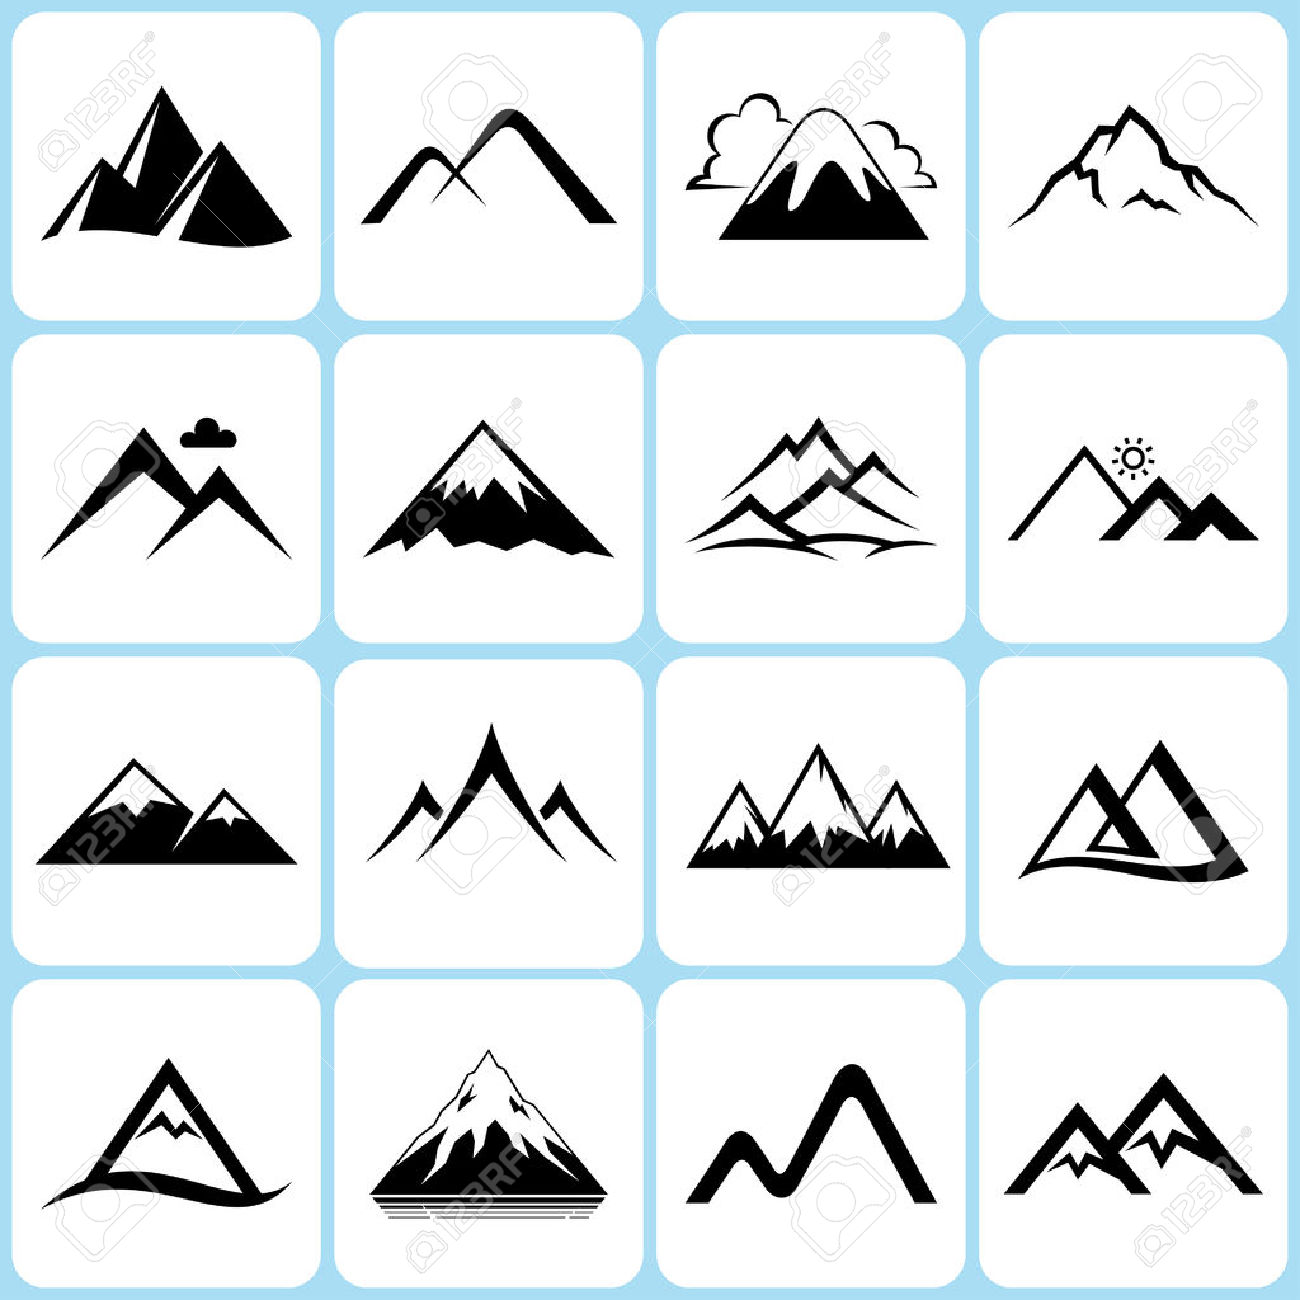 Mountain Ridge clipart #13, Download drawings